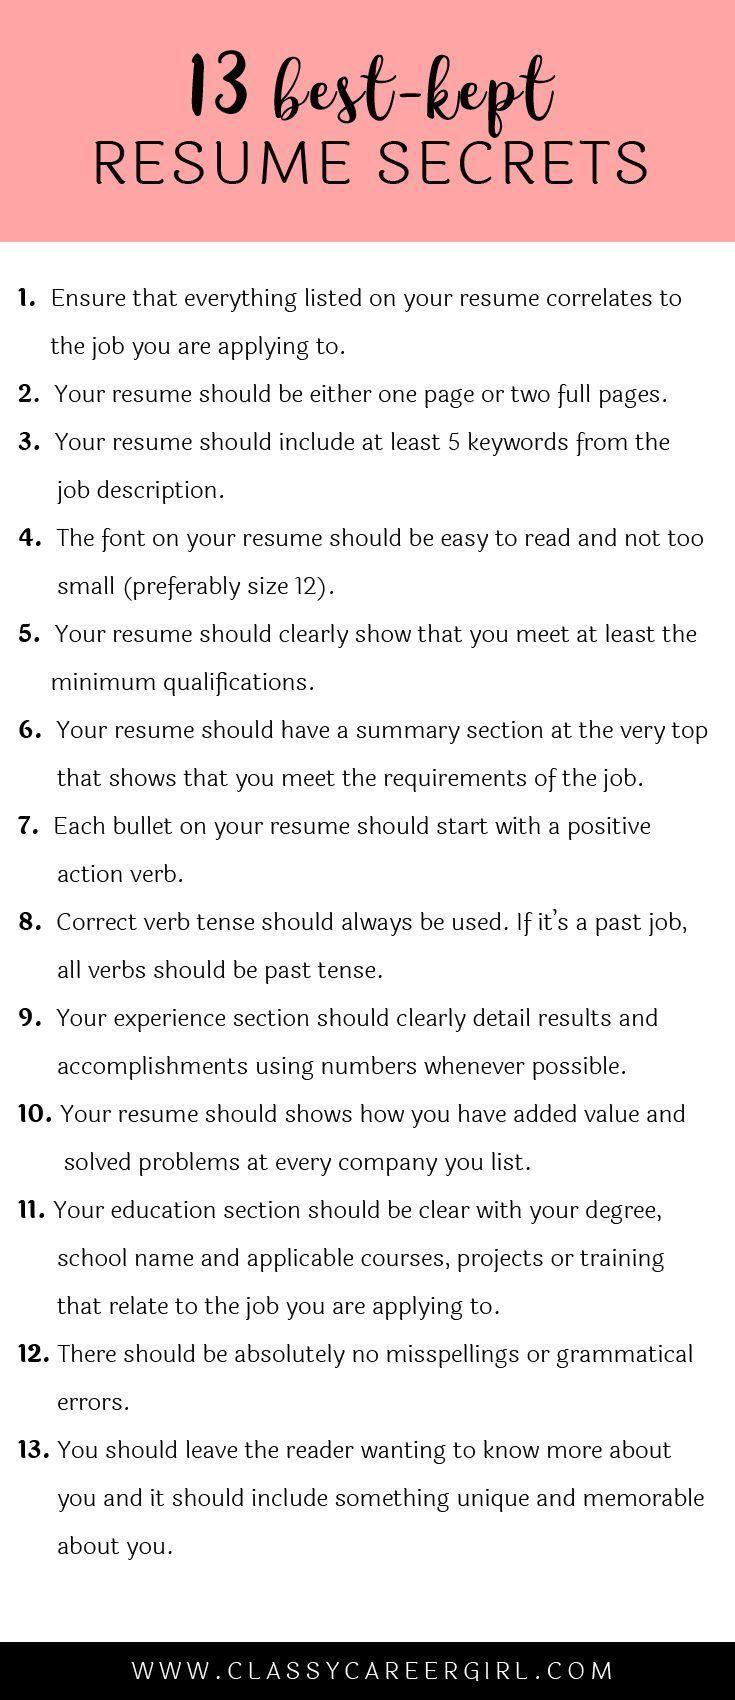 17 Best ideas about Entrepreneur on Pinterest  Business development plan Marketing ideas and